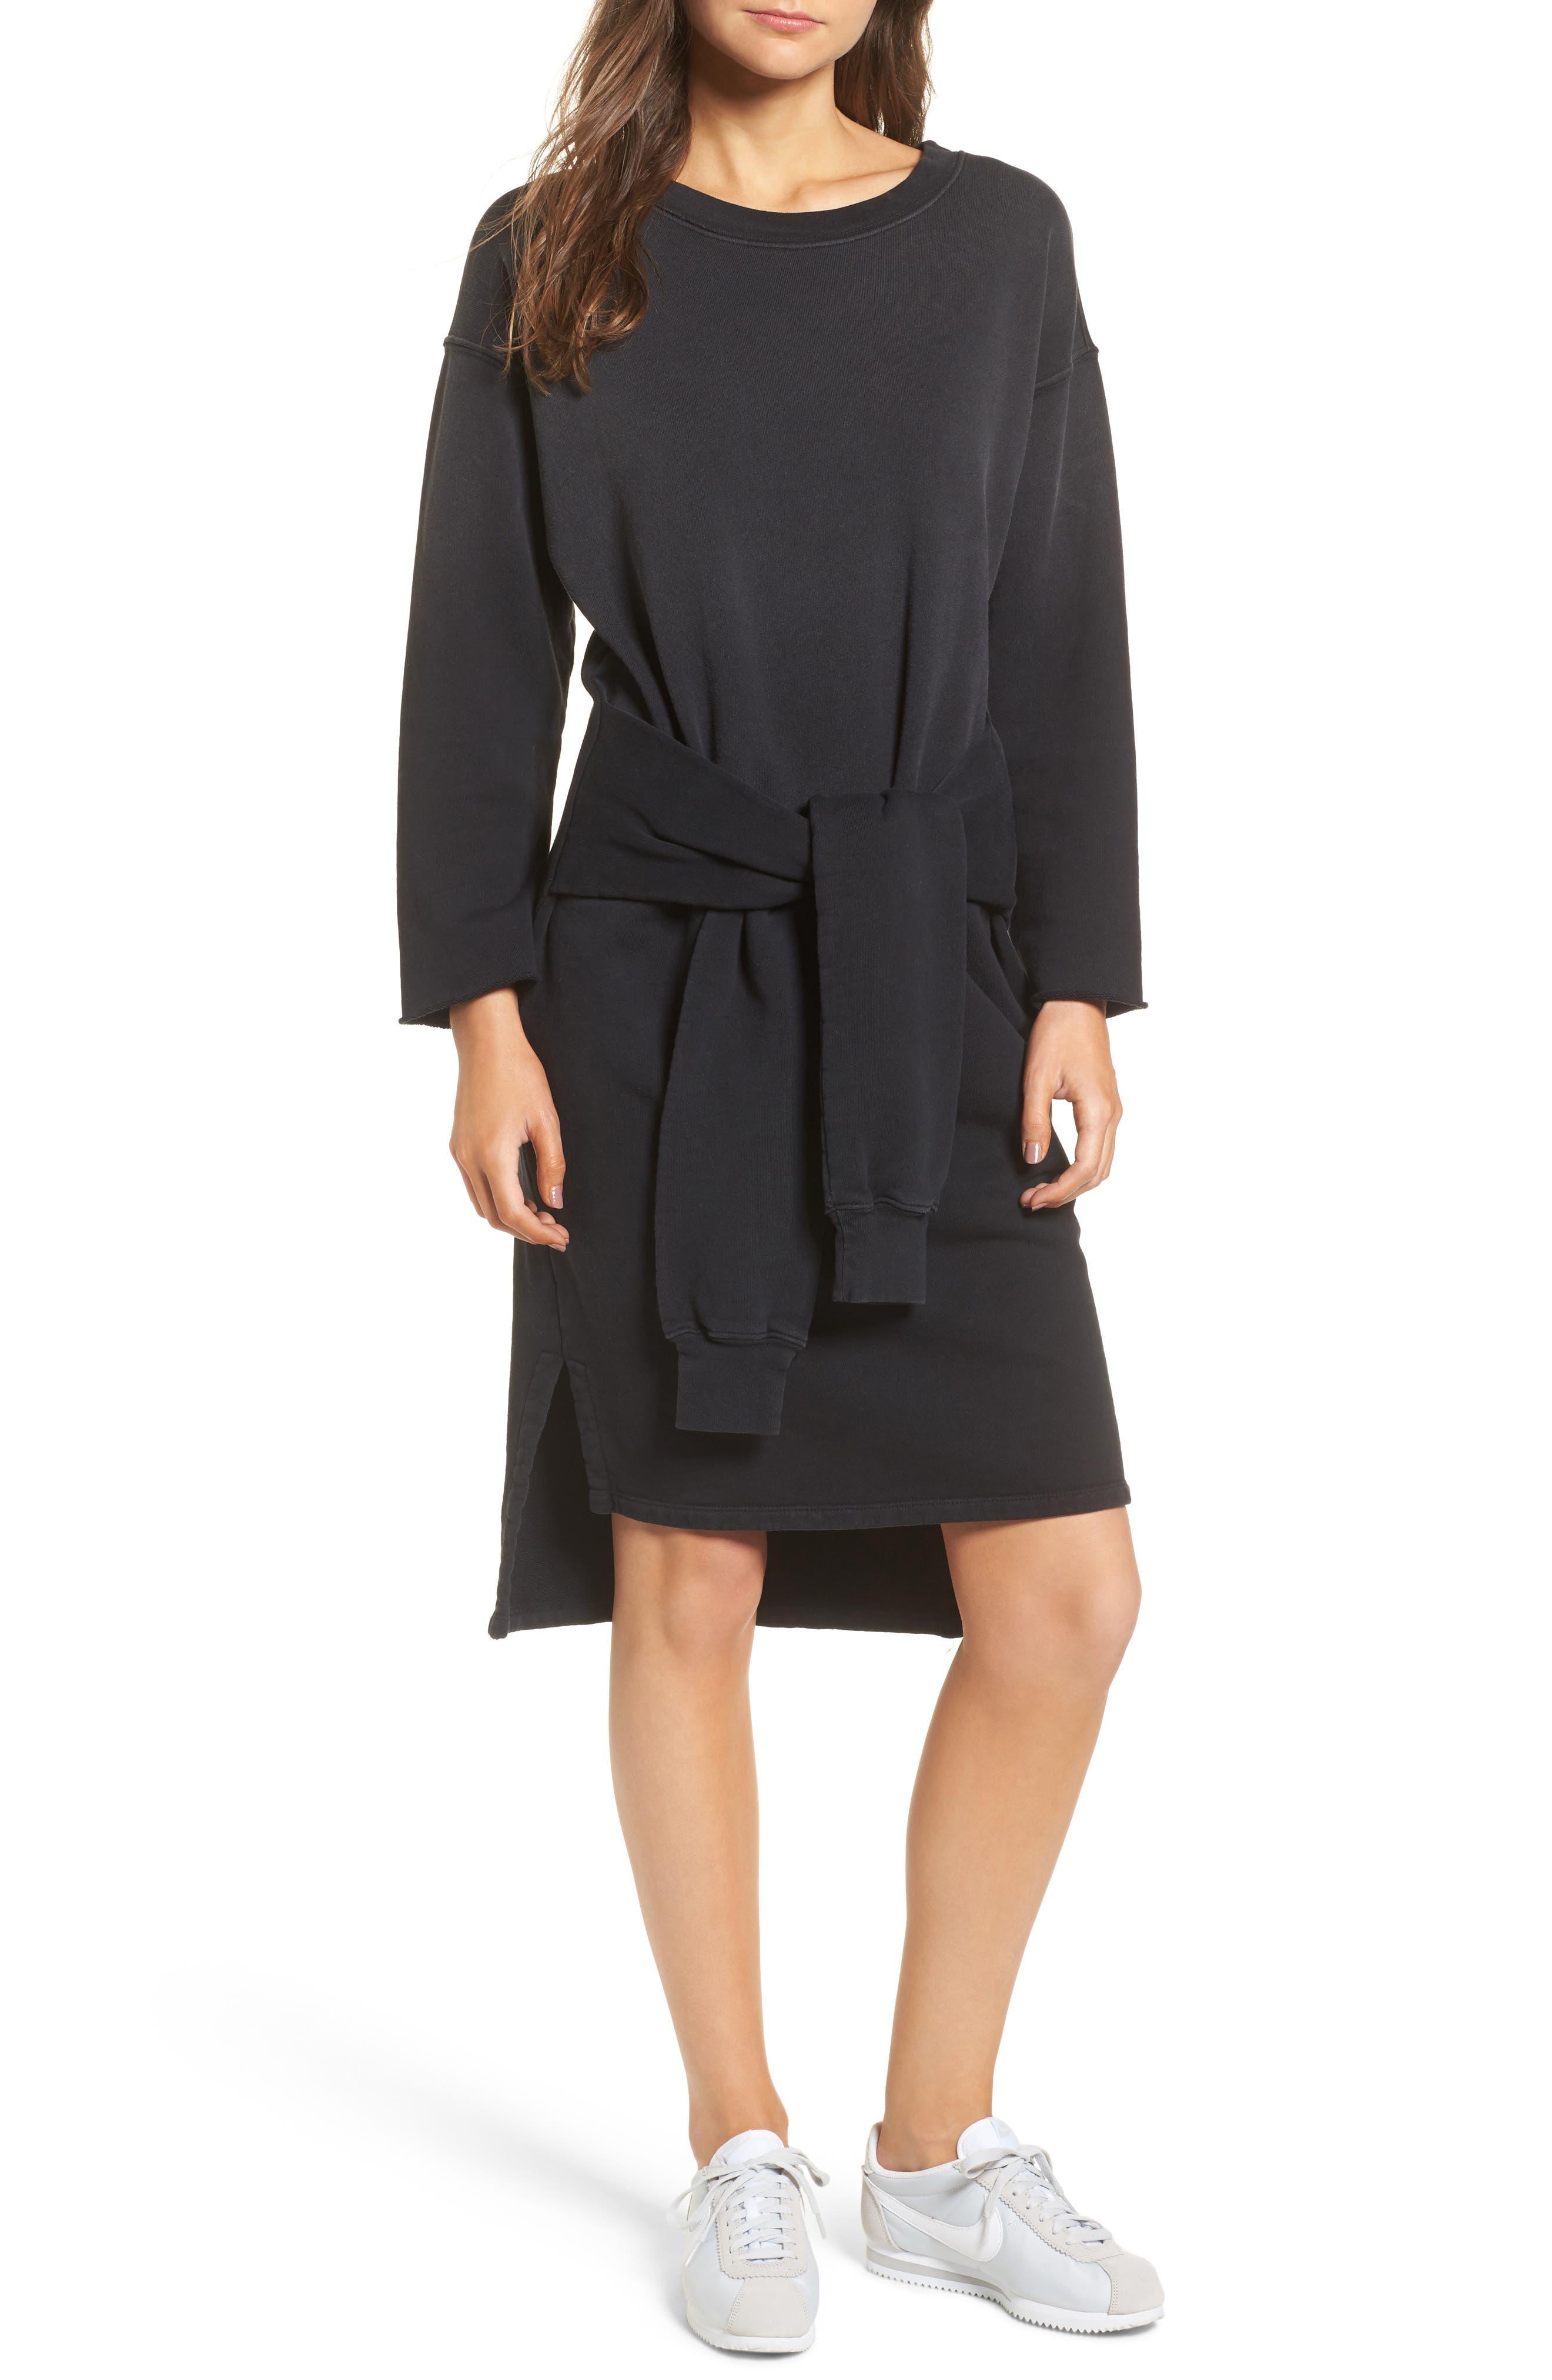 Current/Elliott The Double Sweatshirt Dress